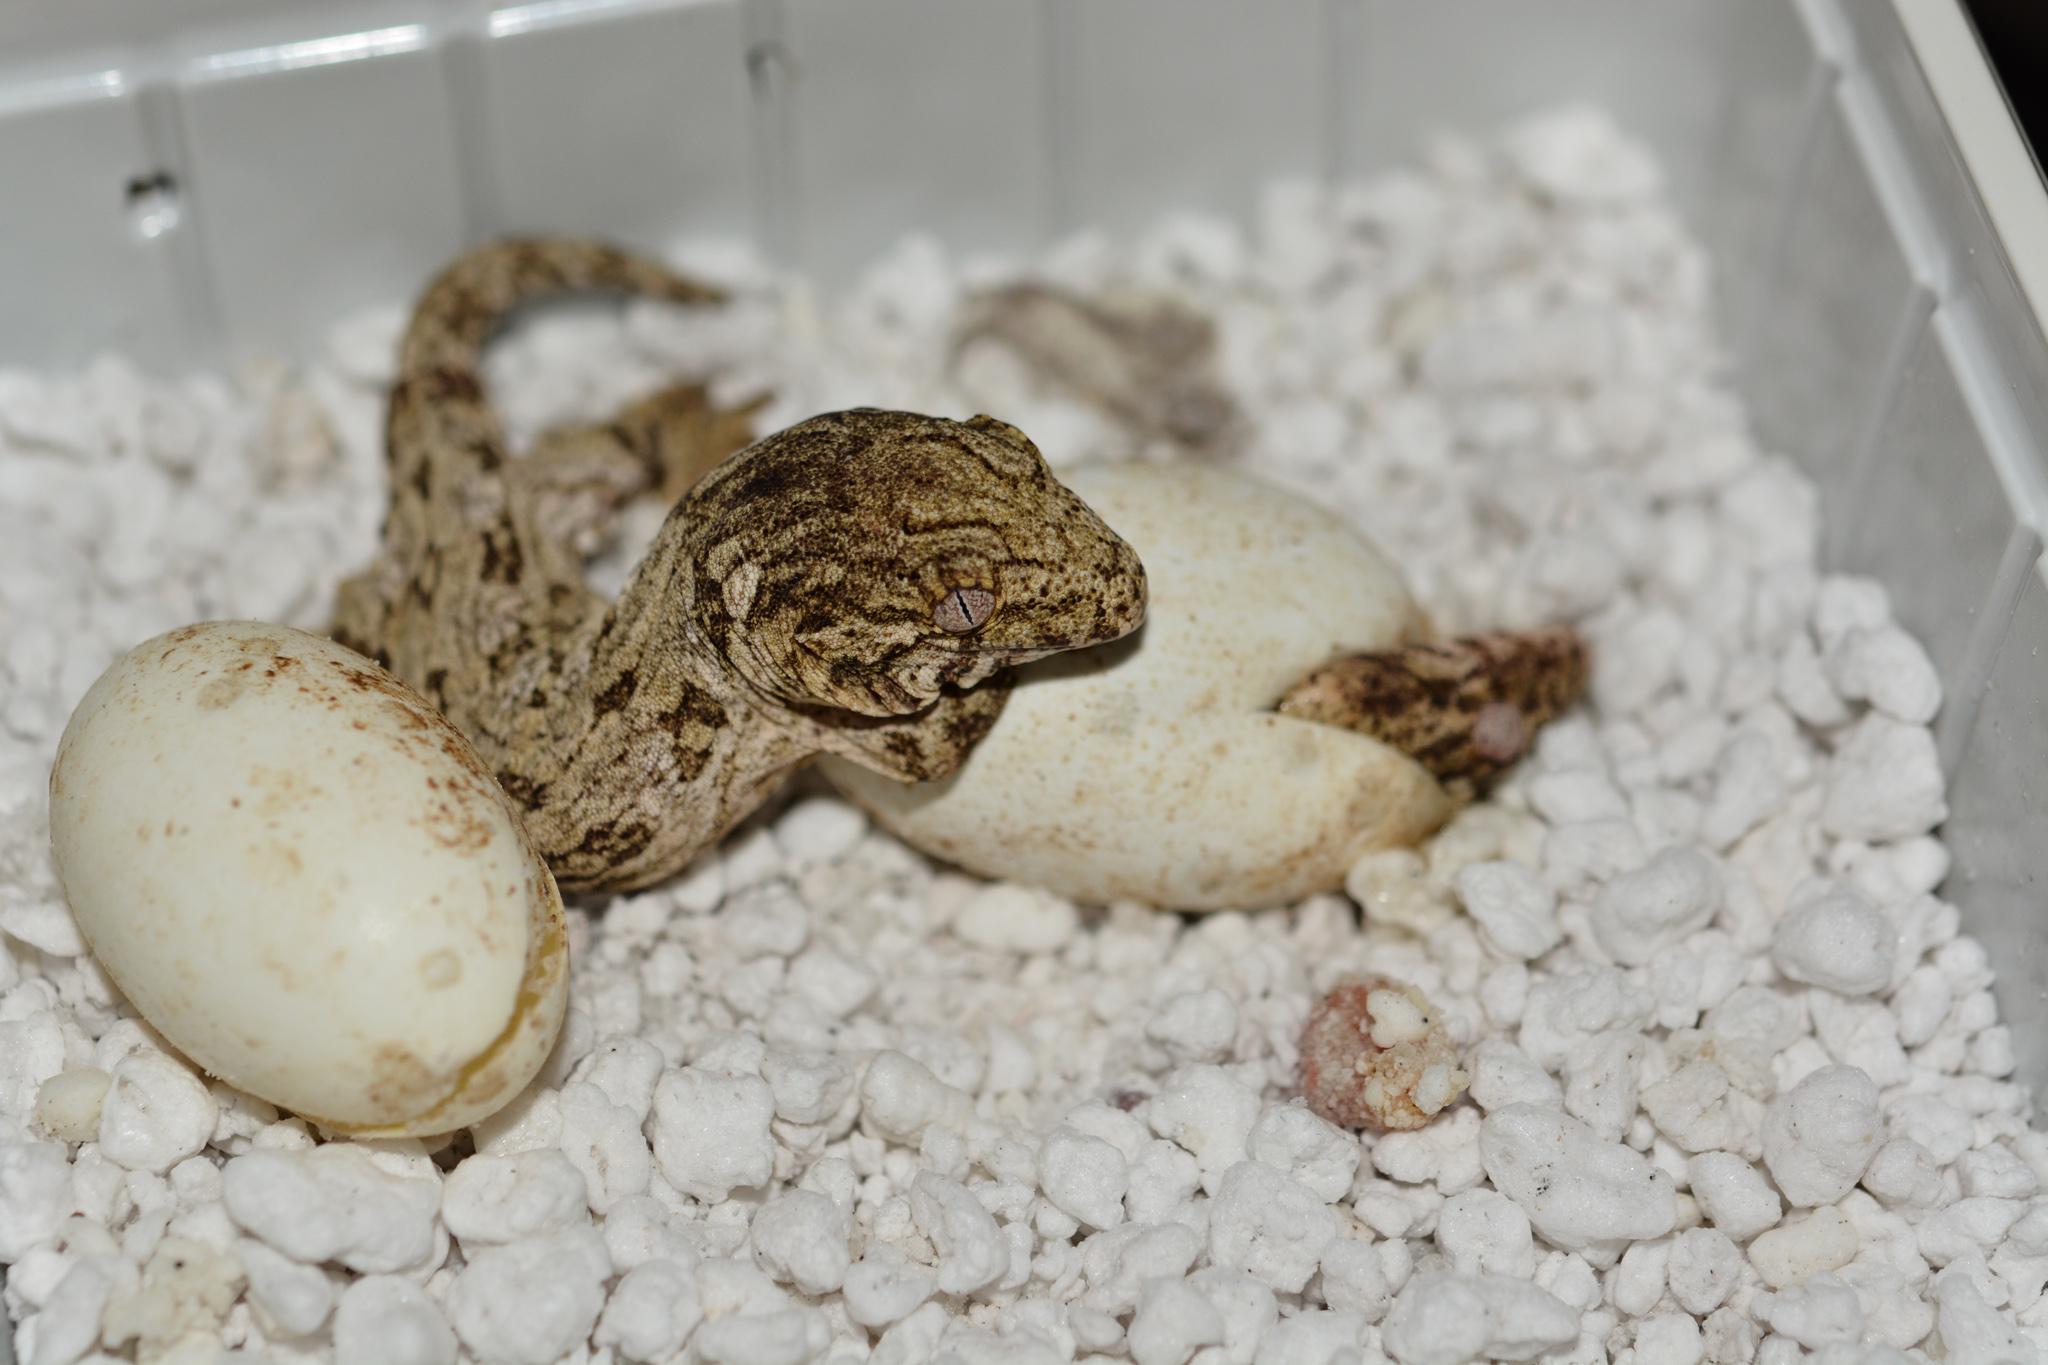 rhacodactylus_leachianus_baby03.jpg